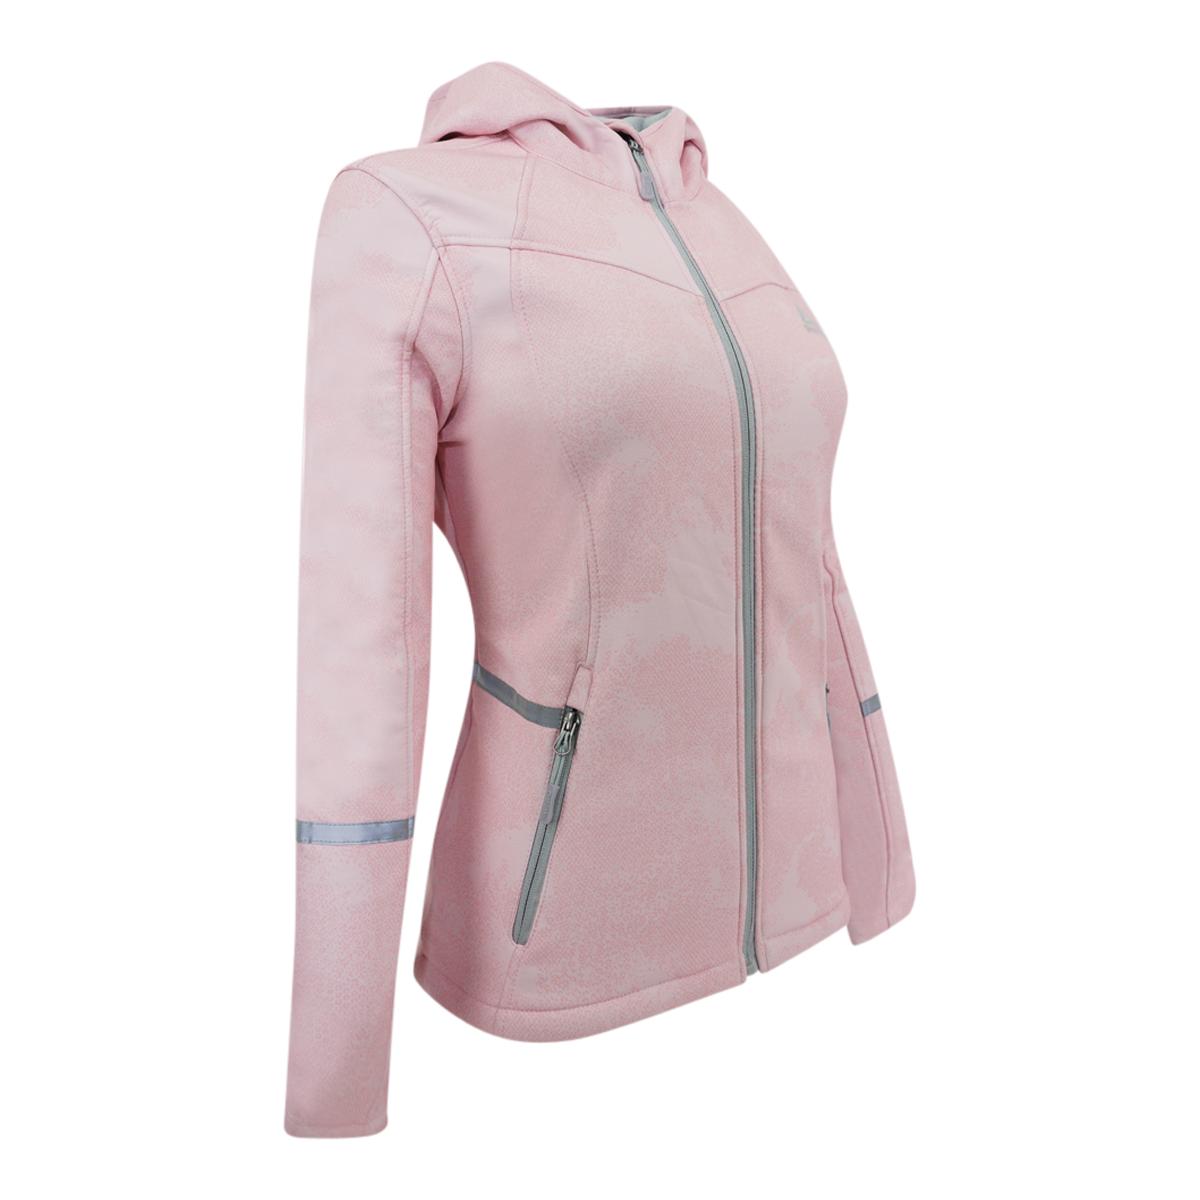 Reebok-Women-039-s-Softshell-Hooded-Jacket thumbnail 8